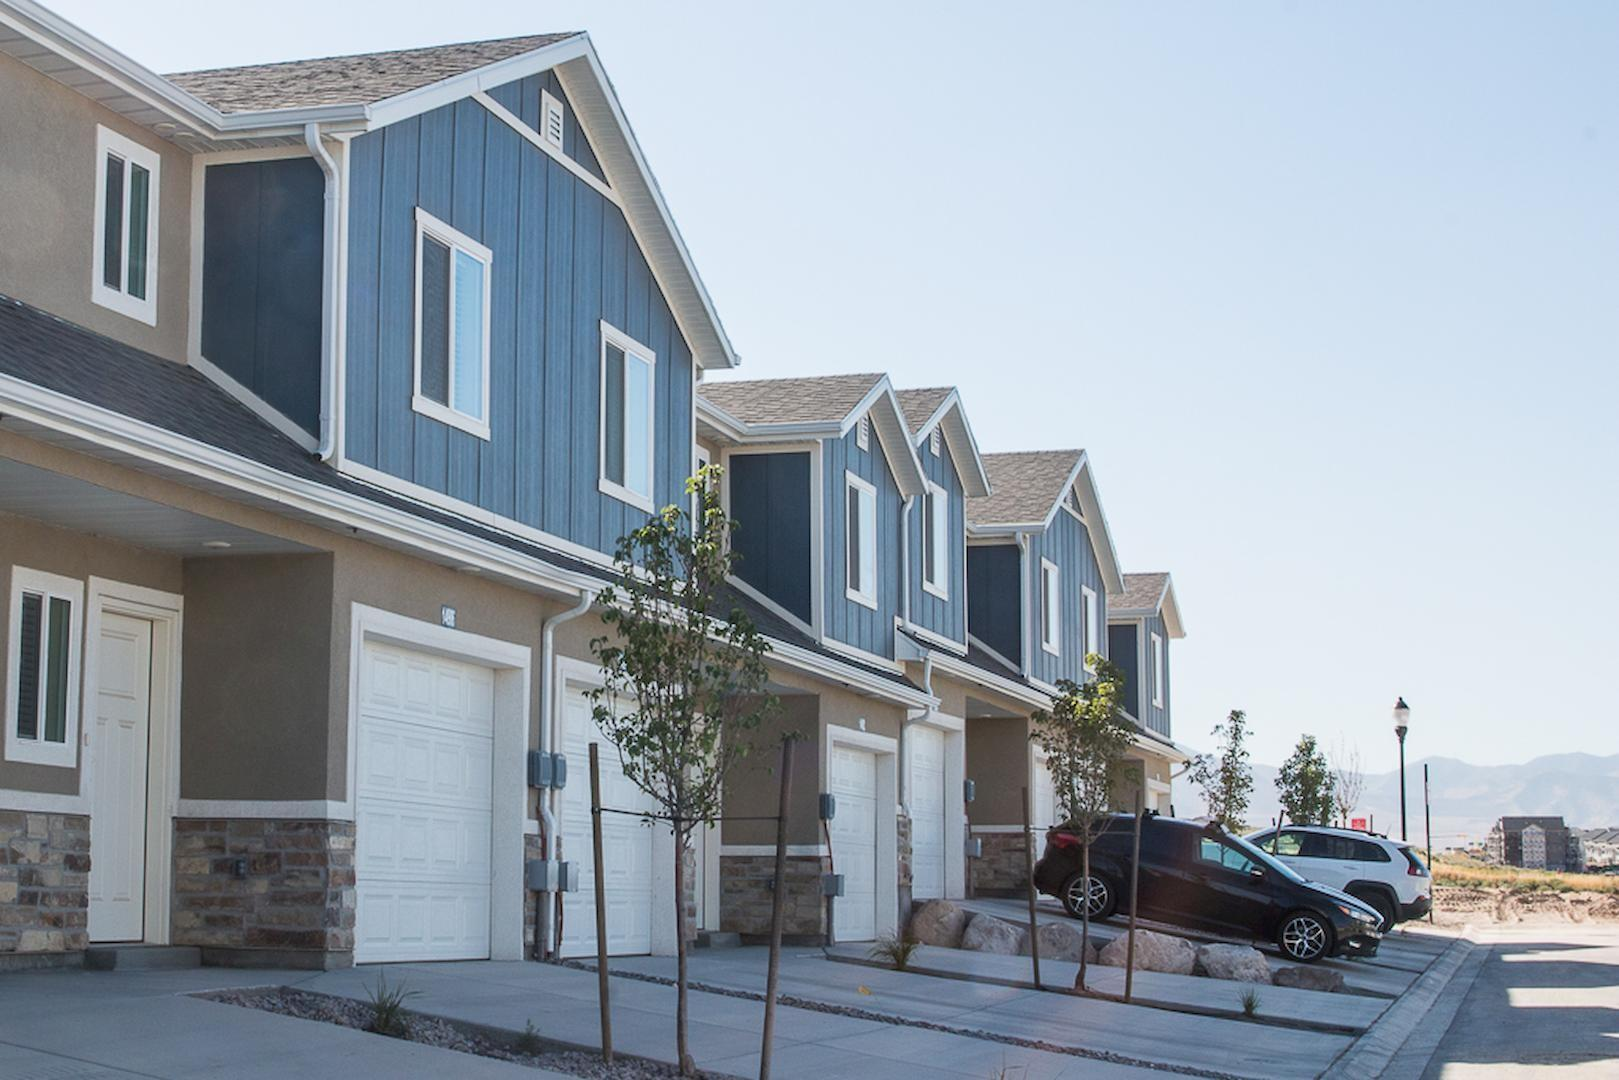 The Boulders is one of Utah's best fourplex developments